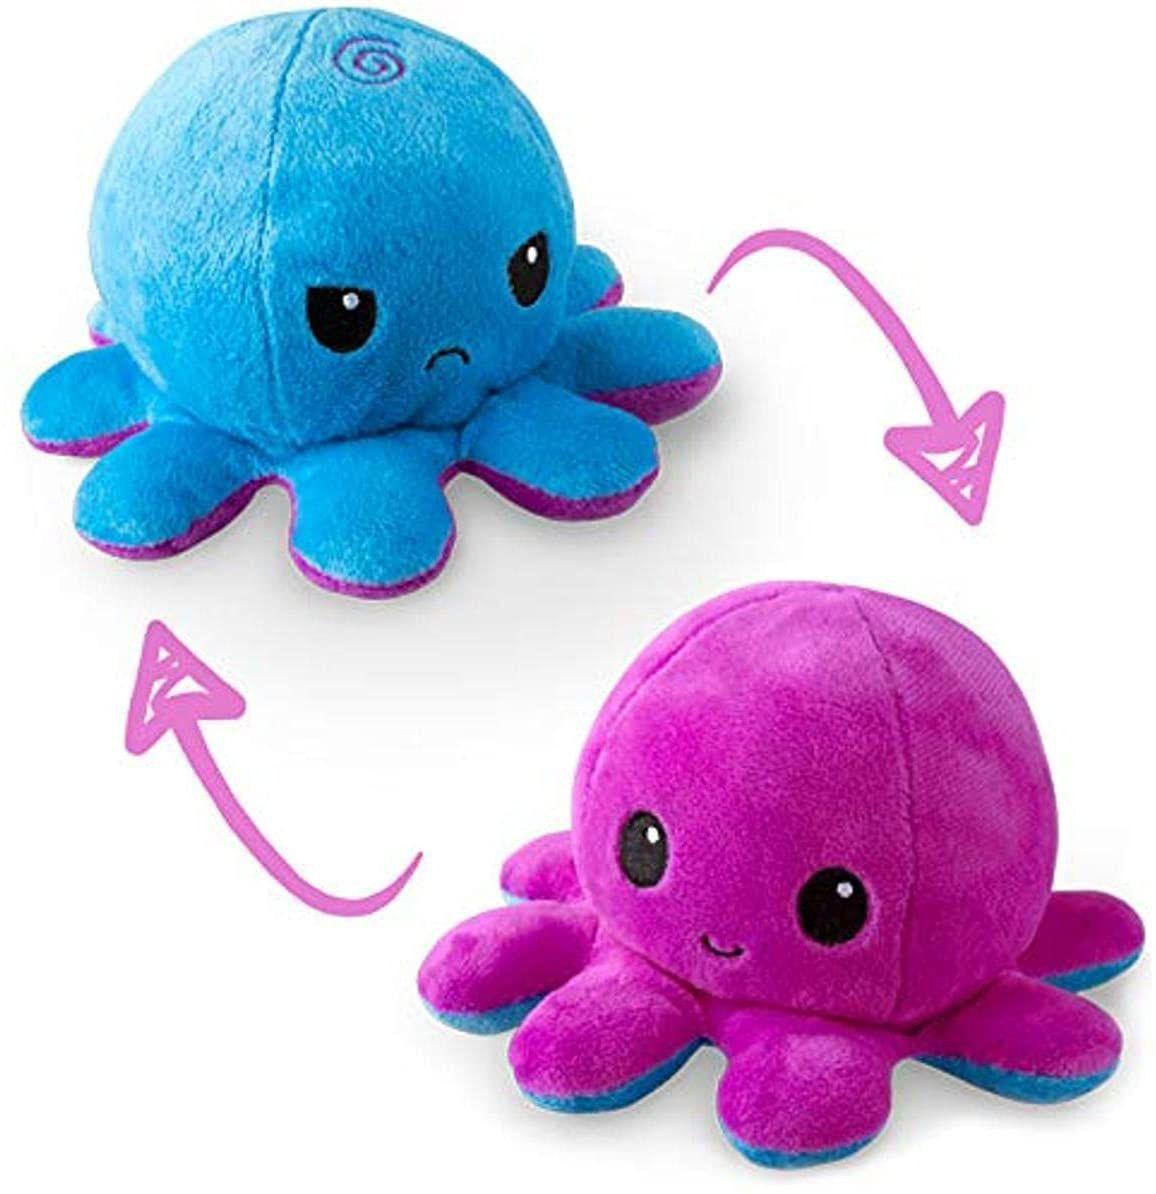 TeeTurtle The Original Reversible Octopus Plushie